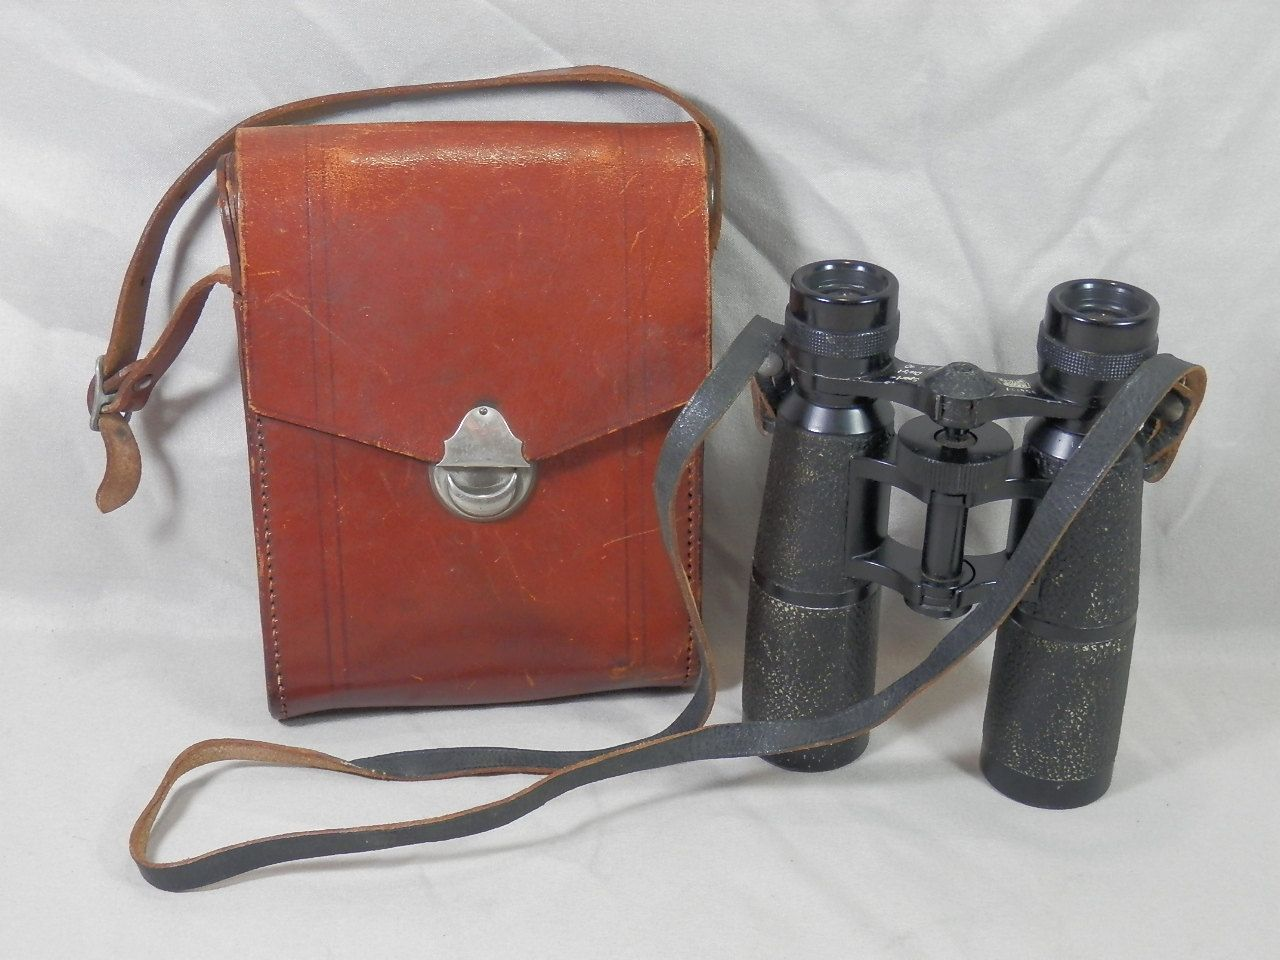 Vintage Hensoldt Wetzlar Sport Dialyt 8x30 Binoculars Leather Case 354727 GERMAN by CaymanHillDesigns on Etsy